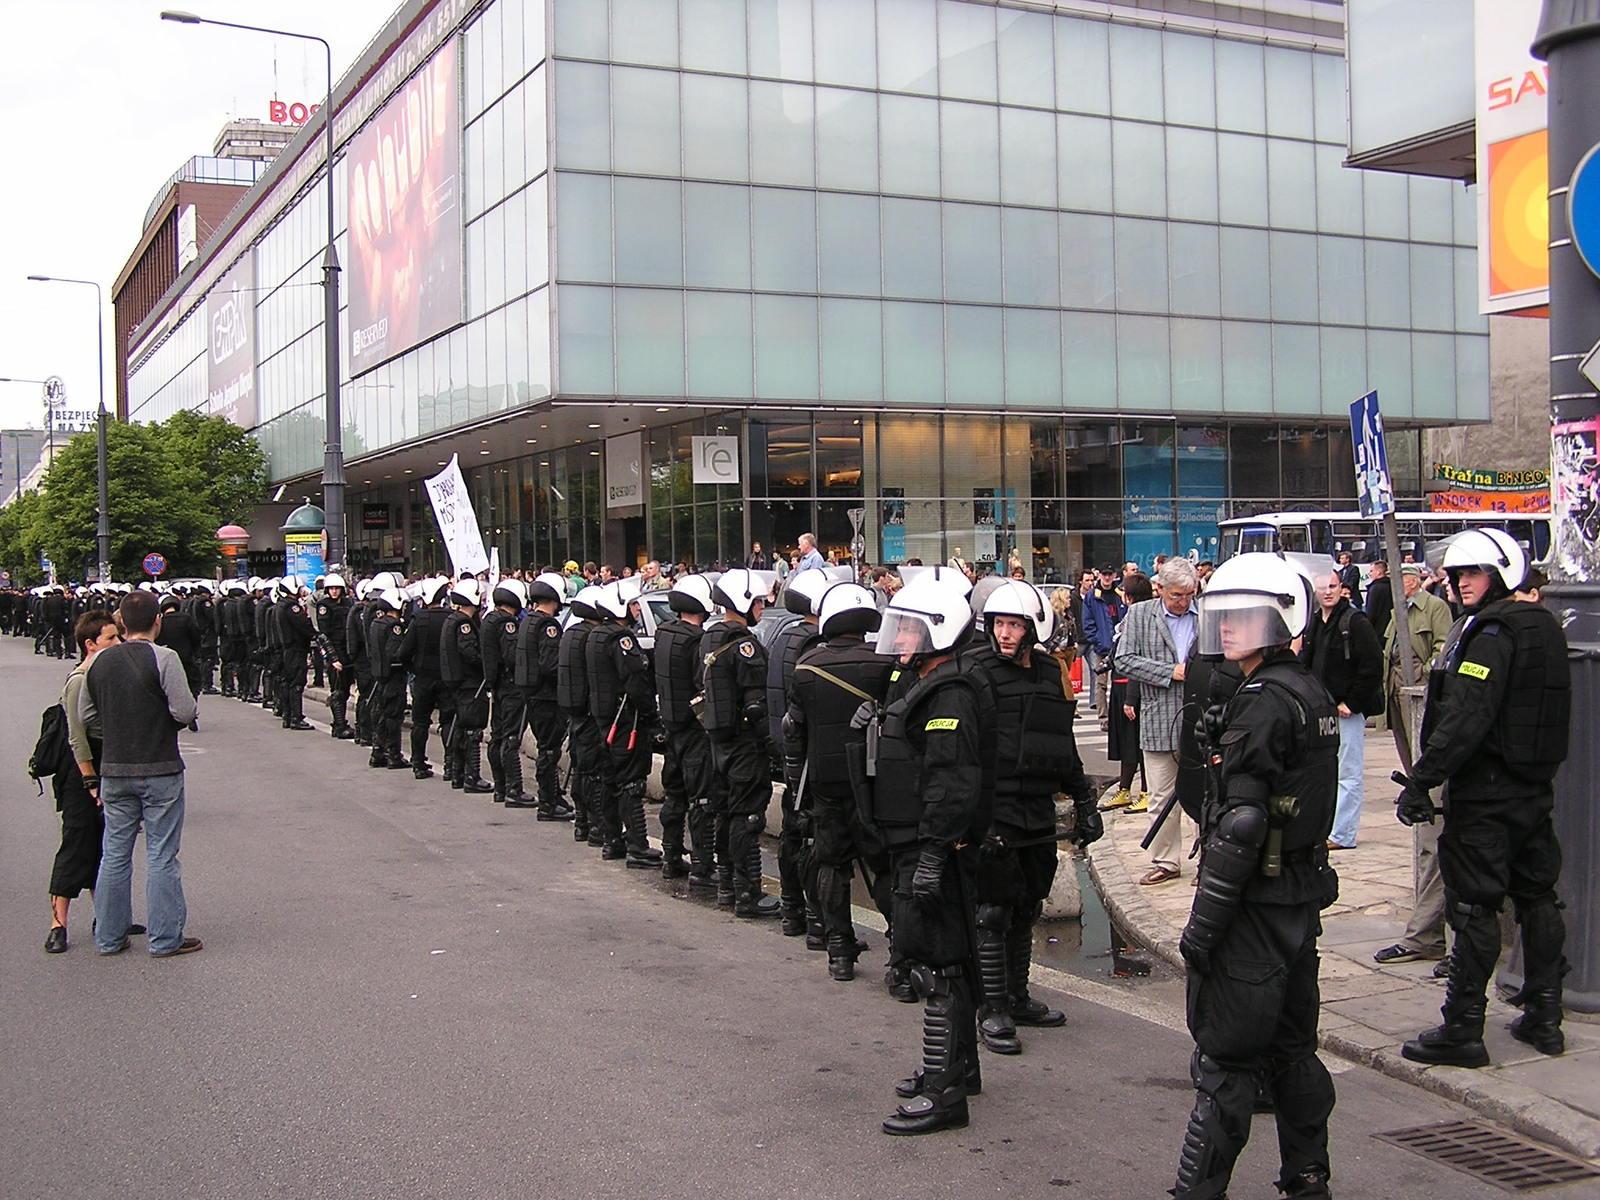 Police squadron